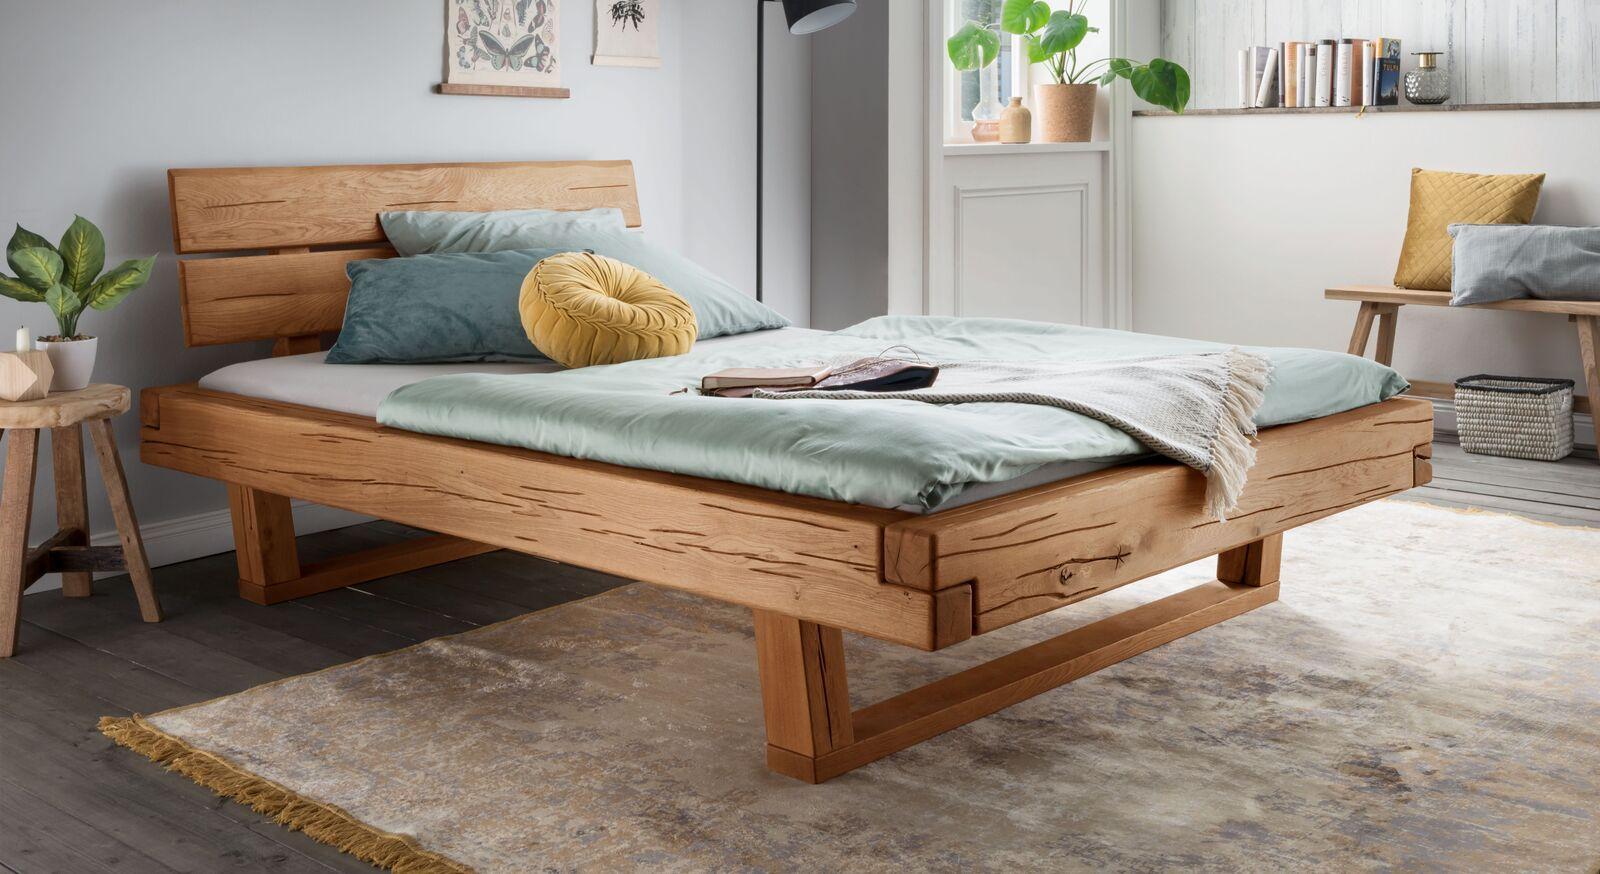 Bett Rigolato aus hochwertigem Massivholz